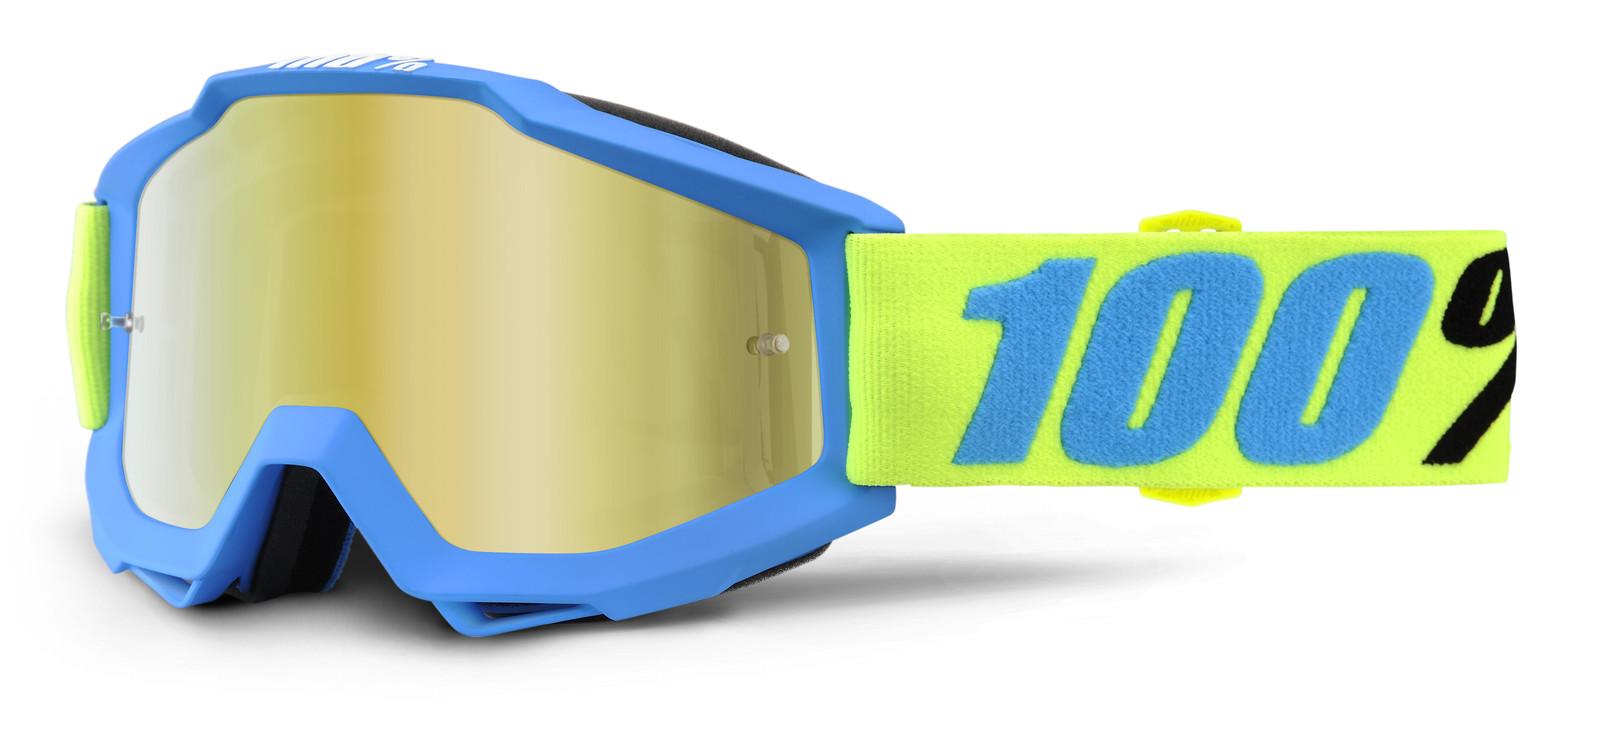 Accuri Belize Goggle - Mirror Gold Lens - 100percent - Motocross Pictures - Vital MX